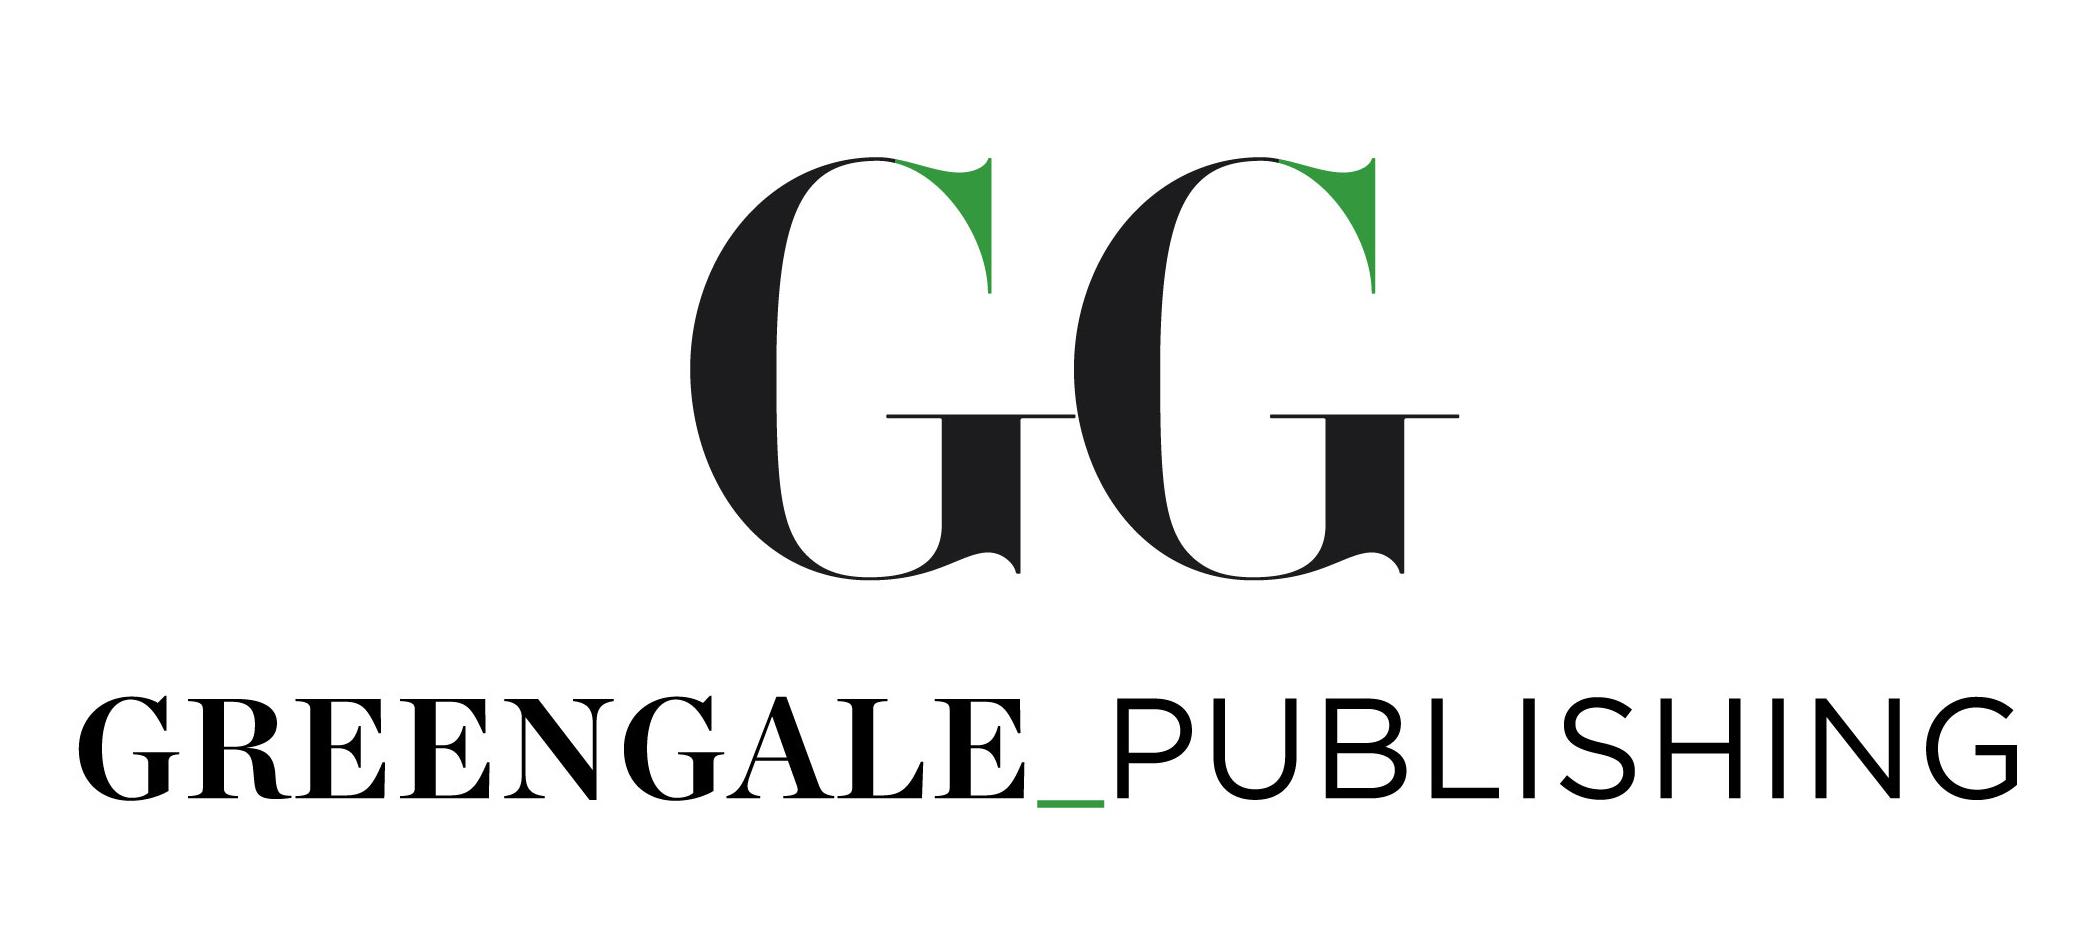 GREENGALE_PUBLISHING_LOGO.jpg